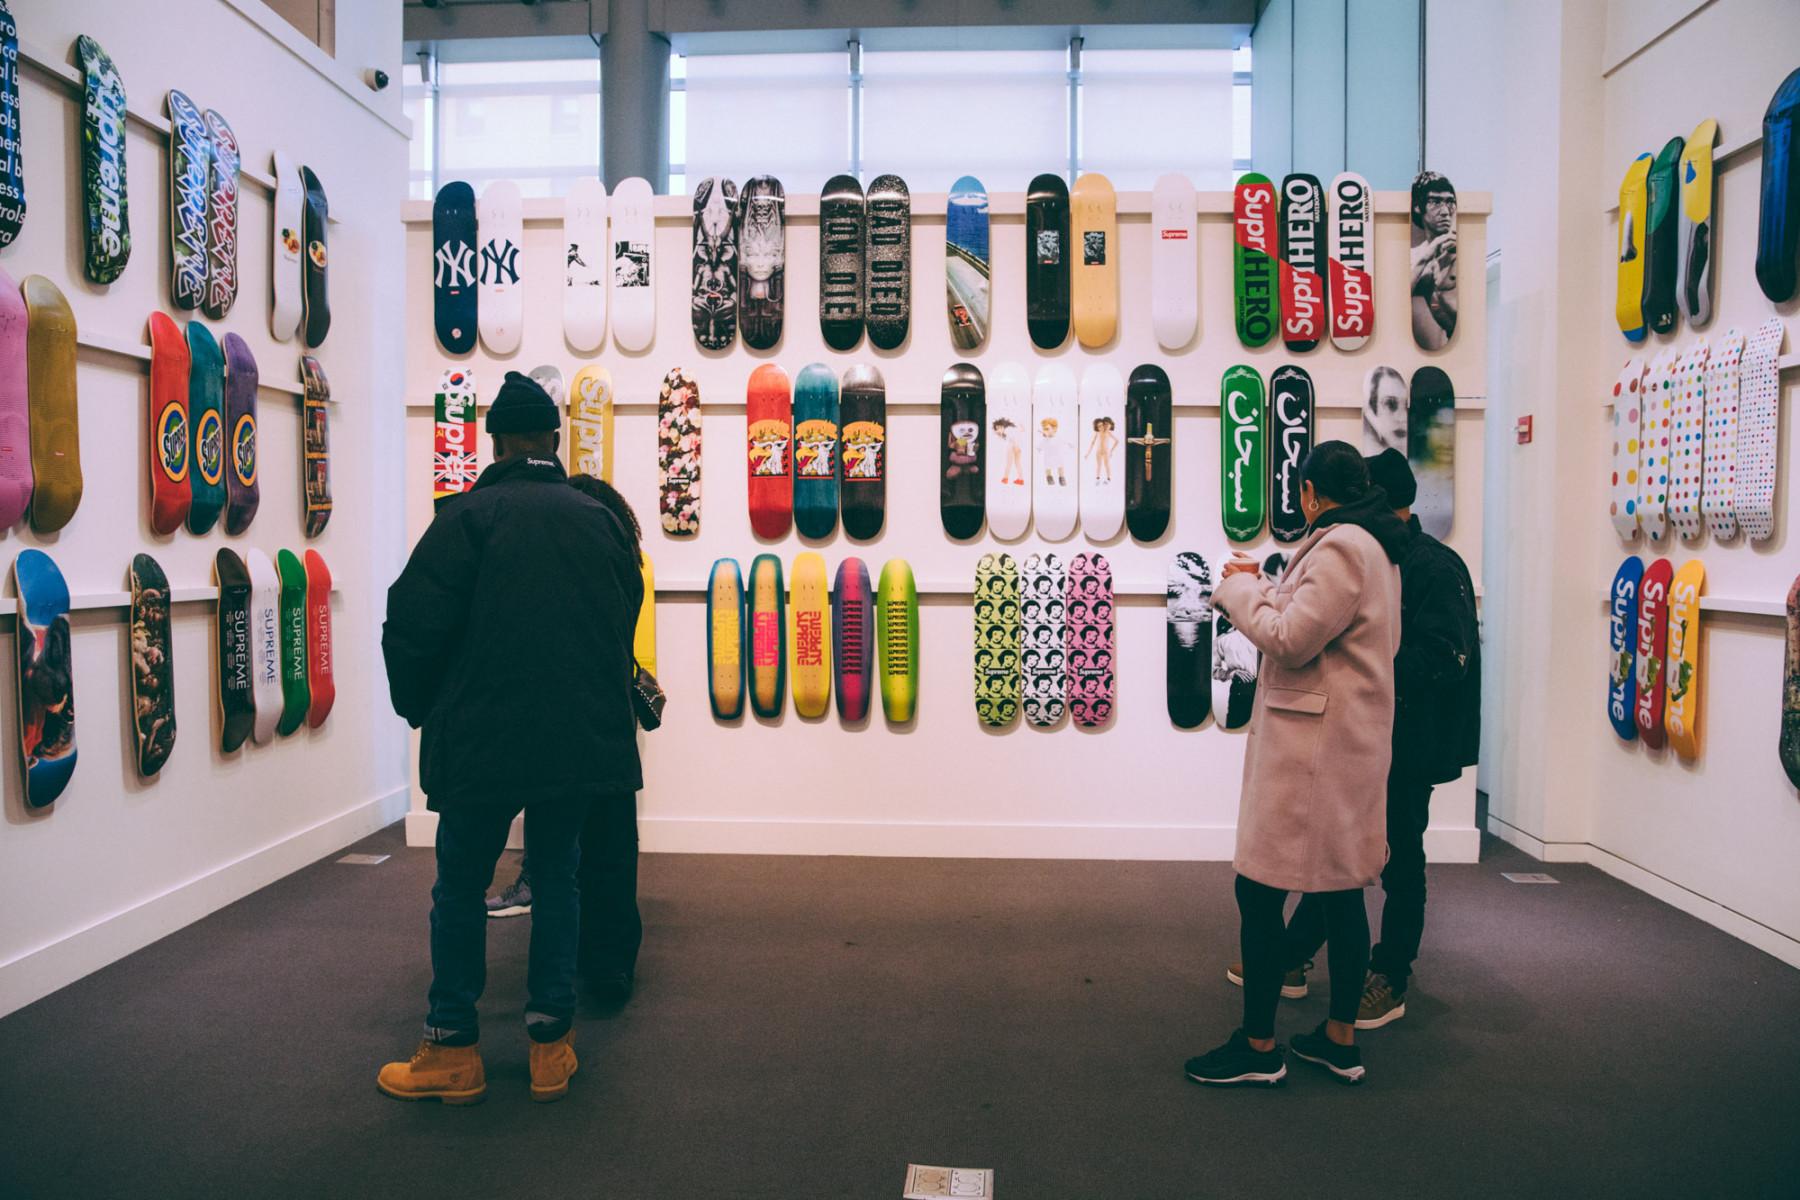 Sothebys-Supreme-Skate-Decks-2-1800x1200